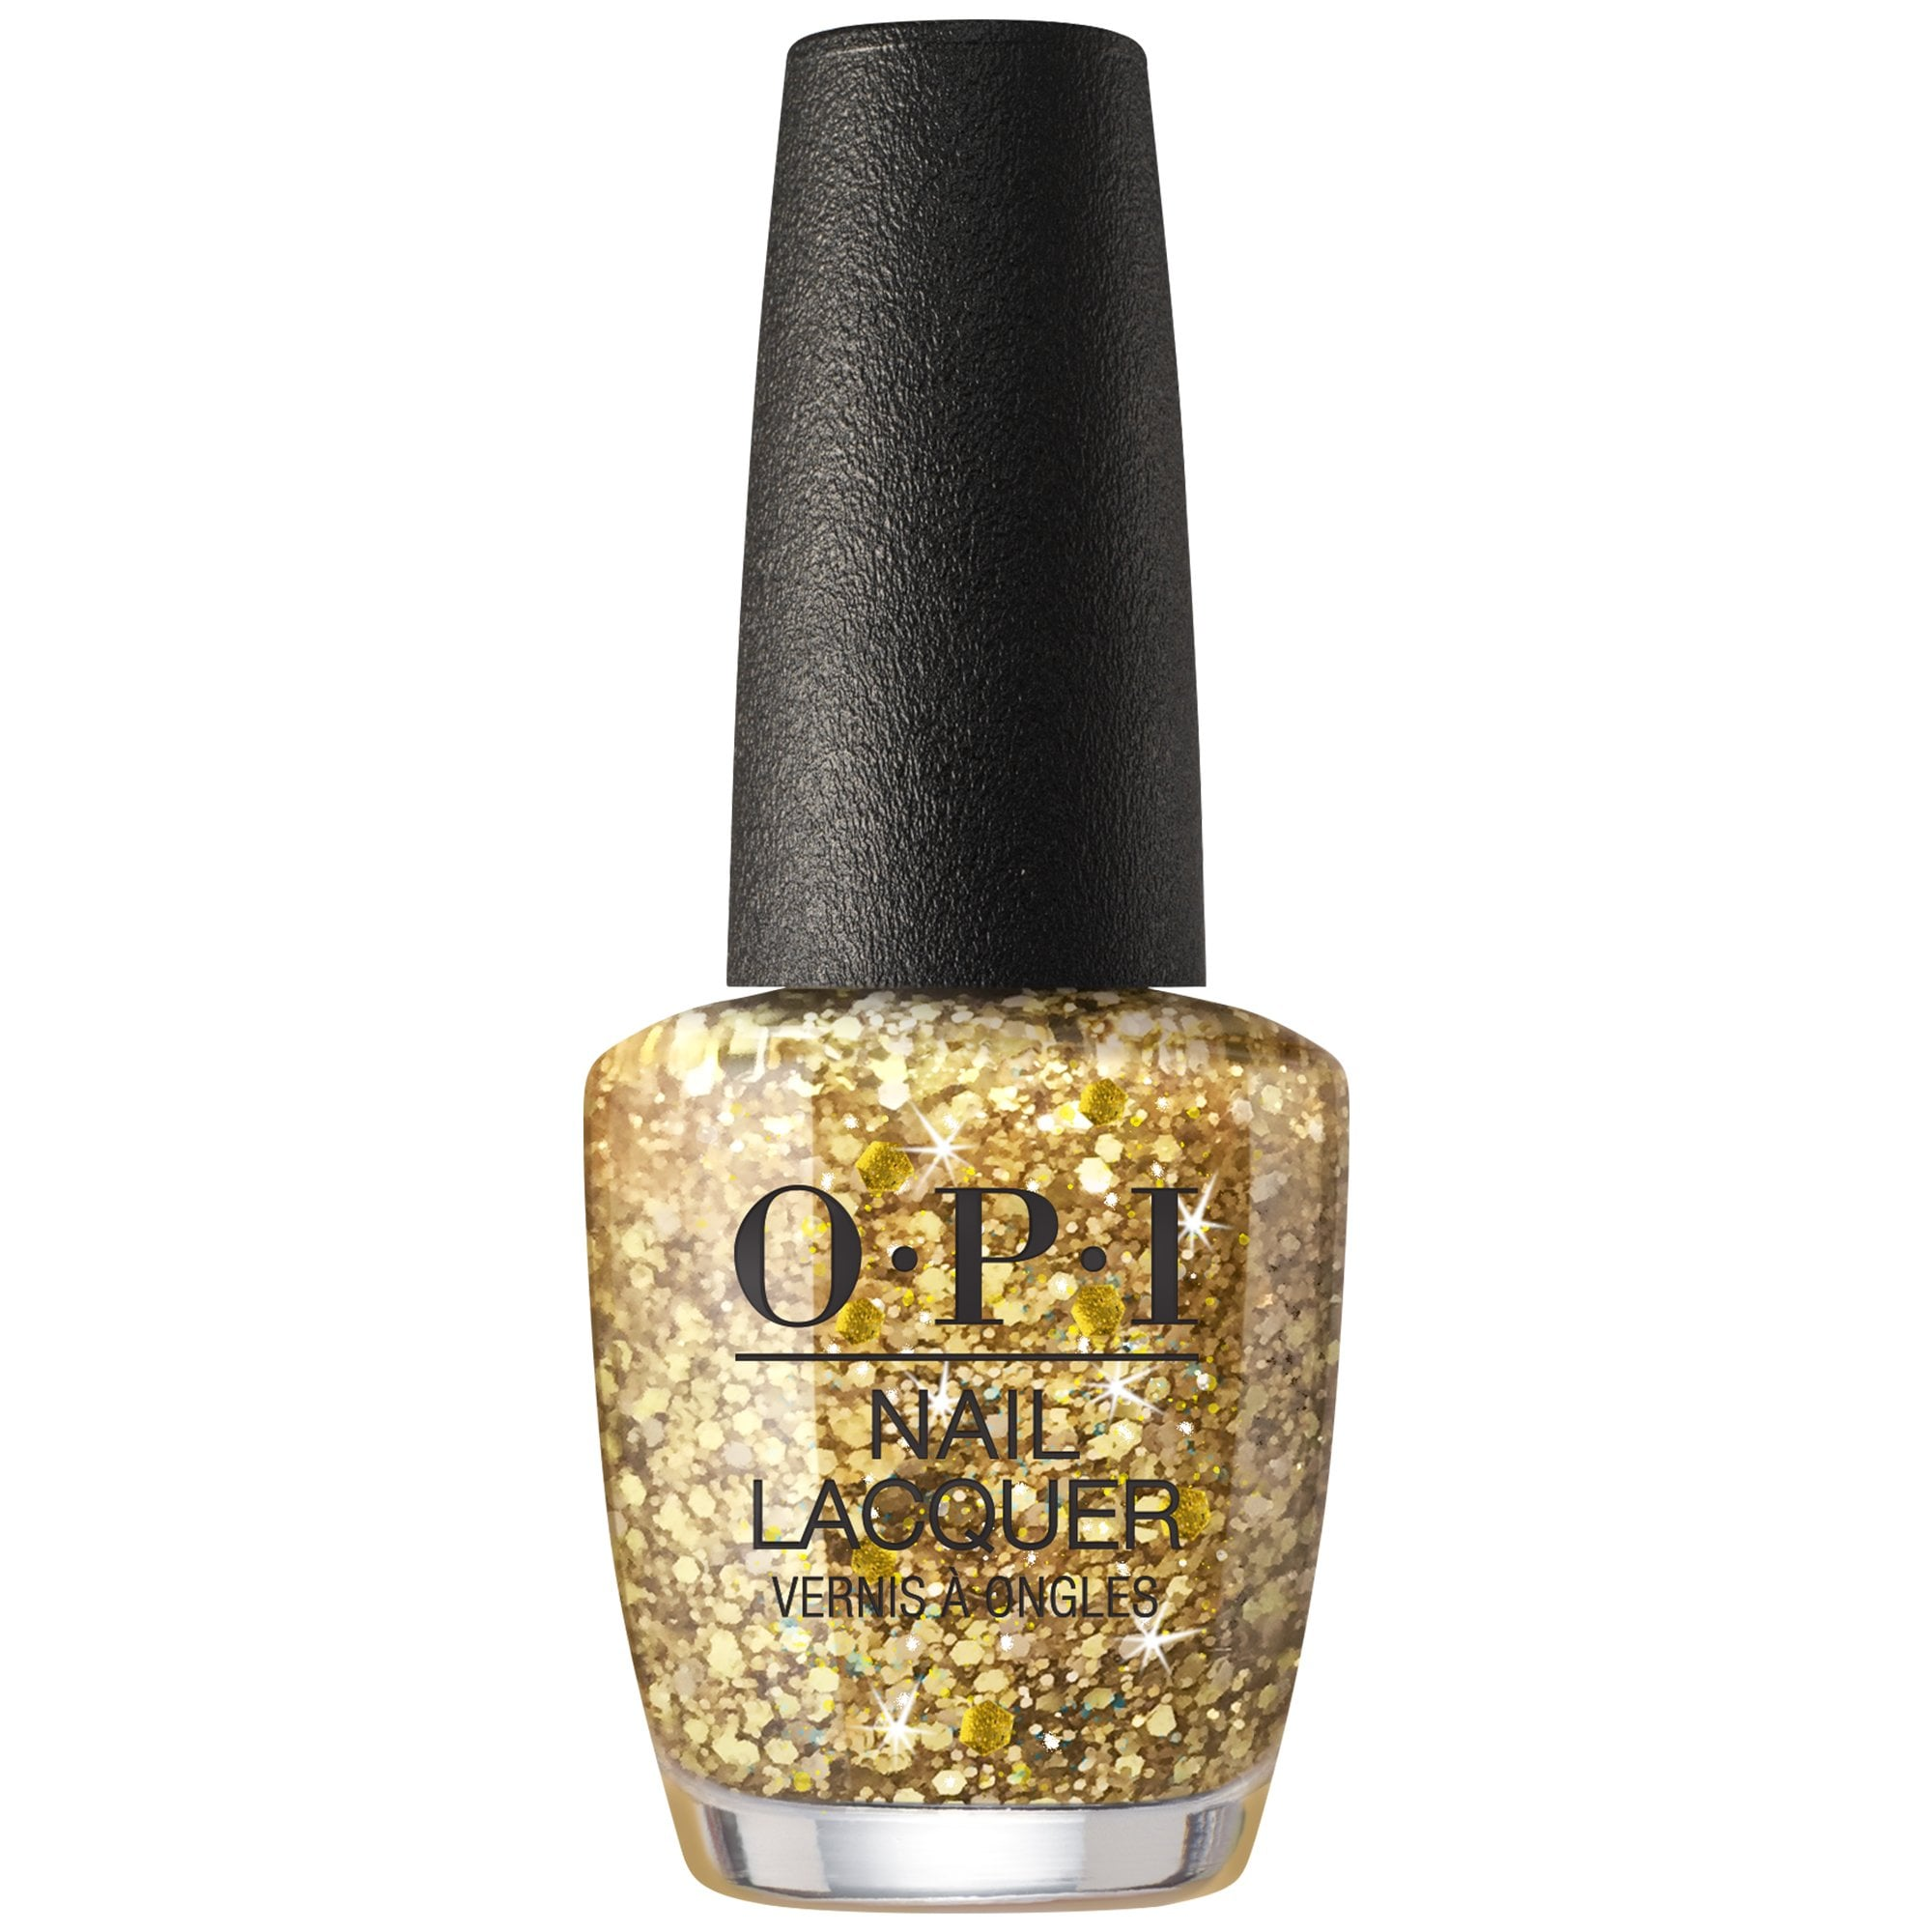 Opi The Nutcracker 2018 Gold Key To The Kingdom Hrk13 15ml